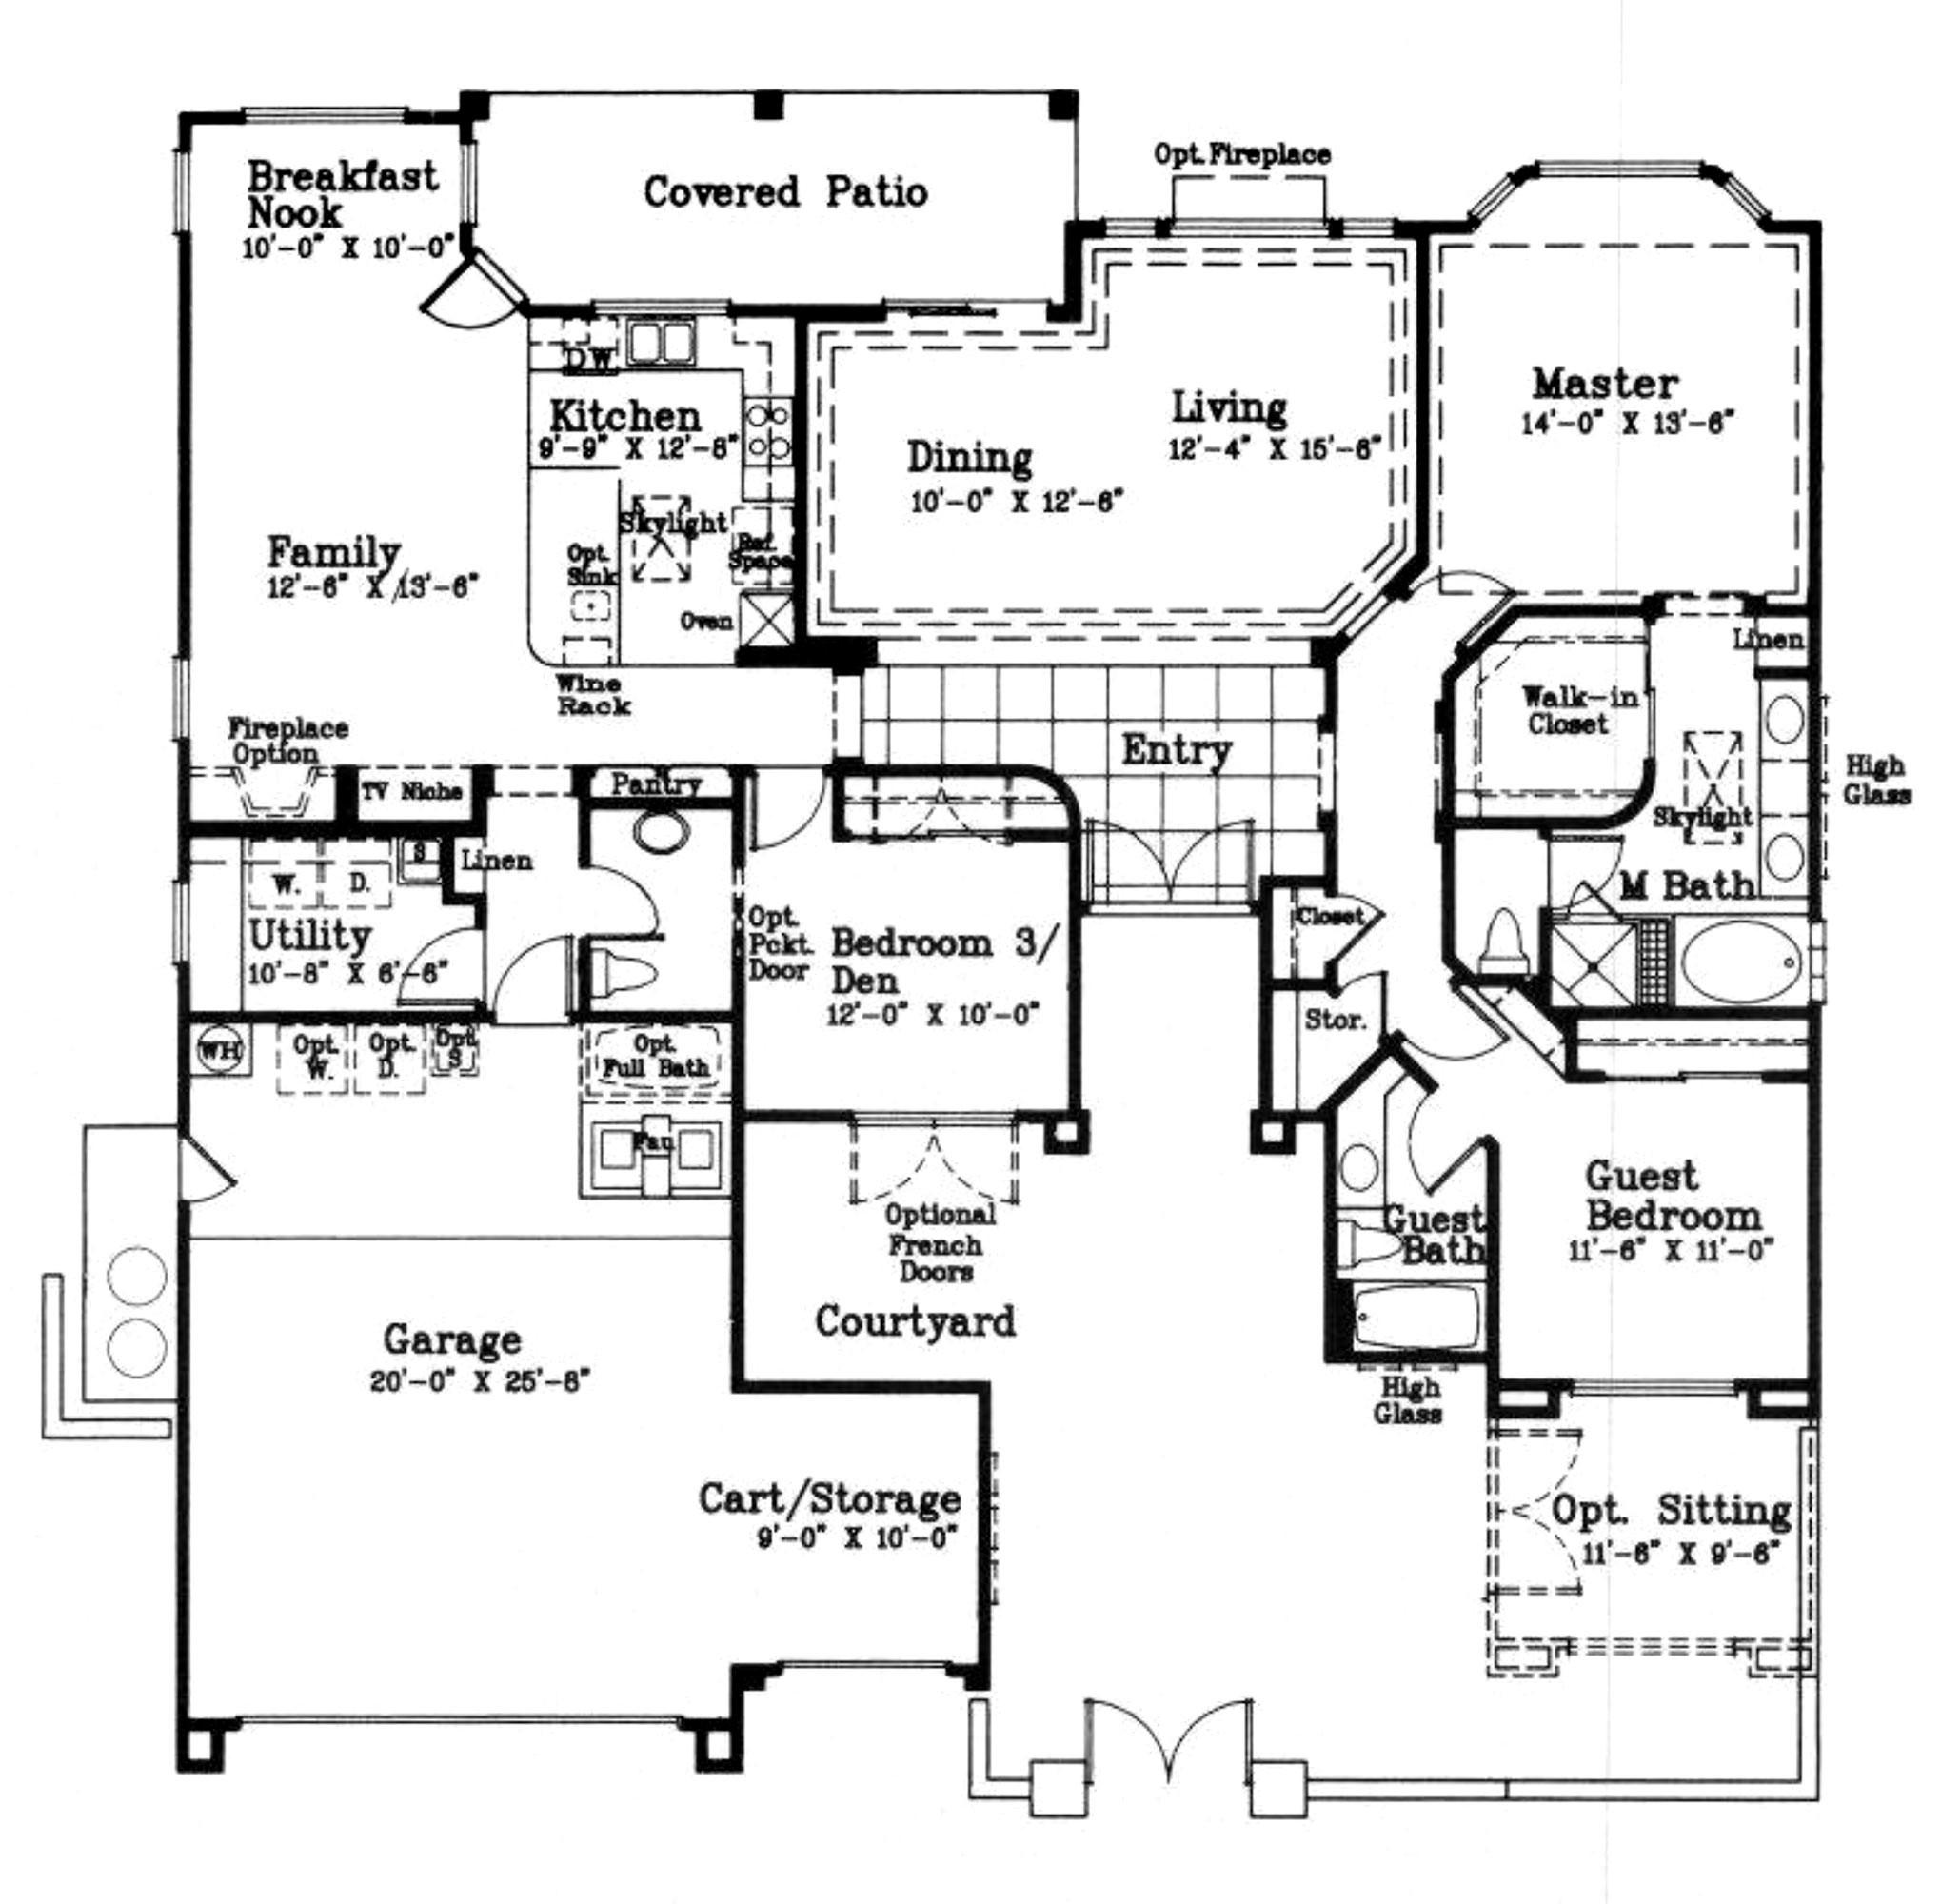 Emerald Model Floor Plan Coachella Valley Area Real Estate The Jelmberg Team